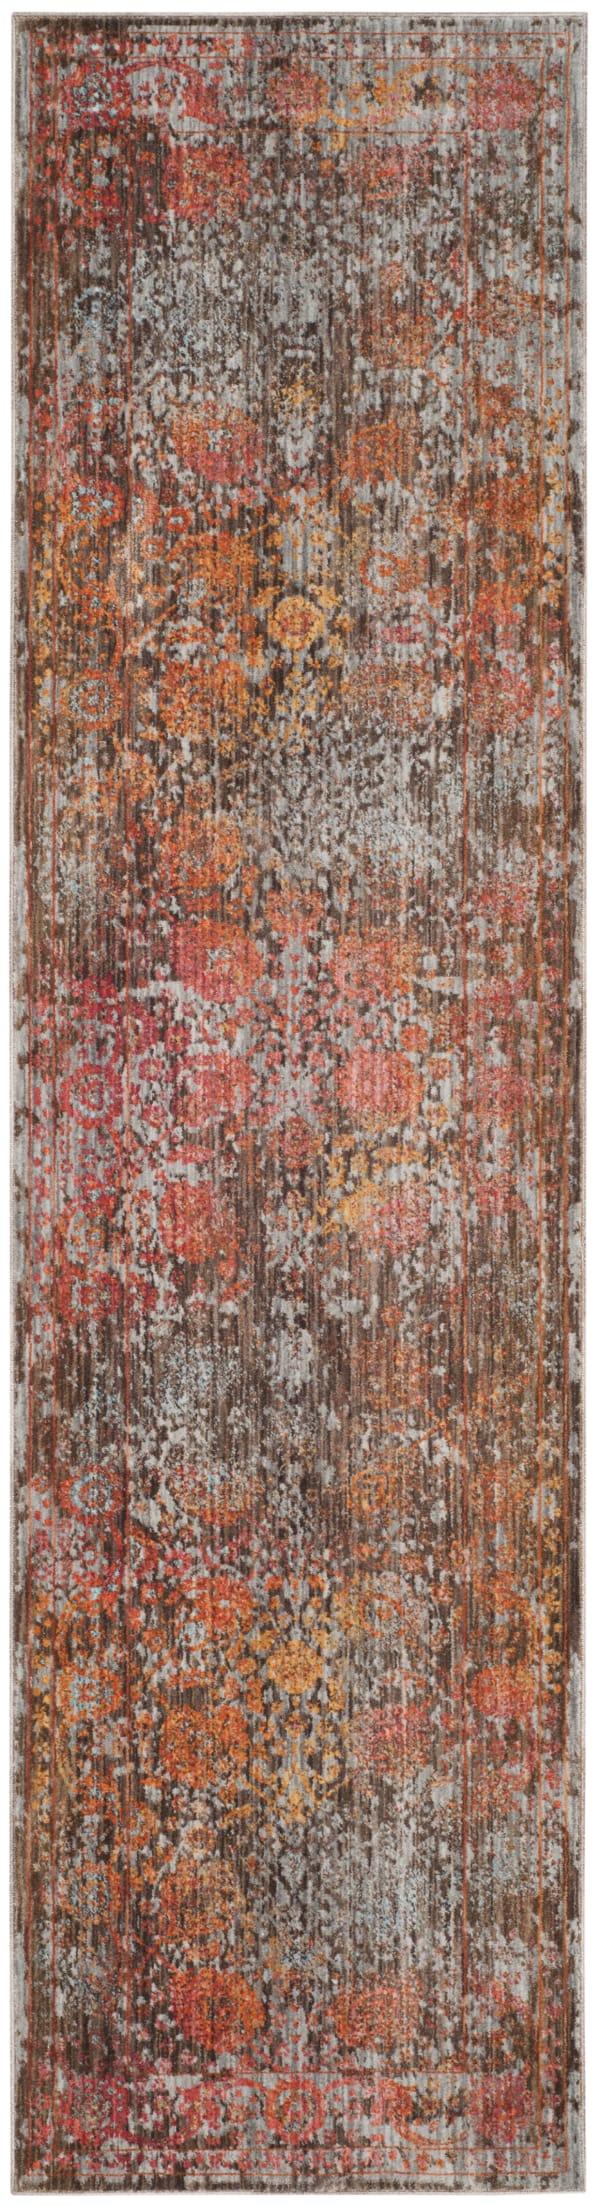 Safavieh Brown Polyester Rug